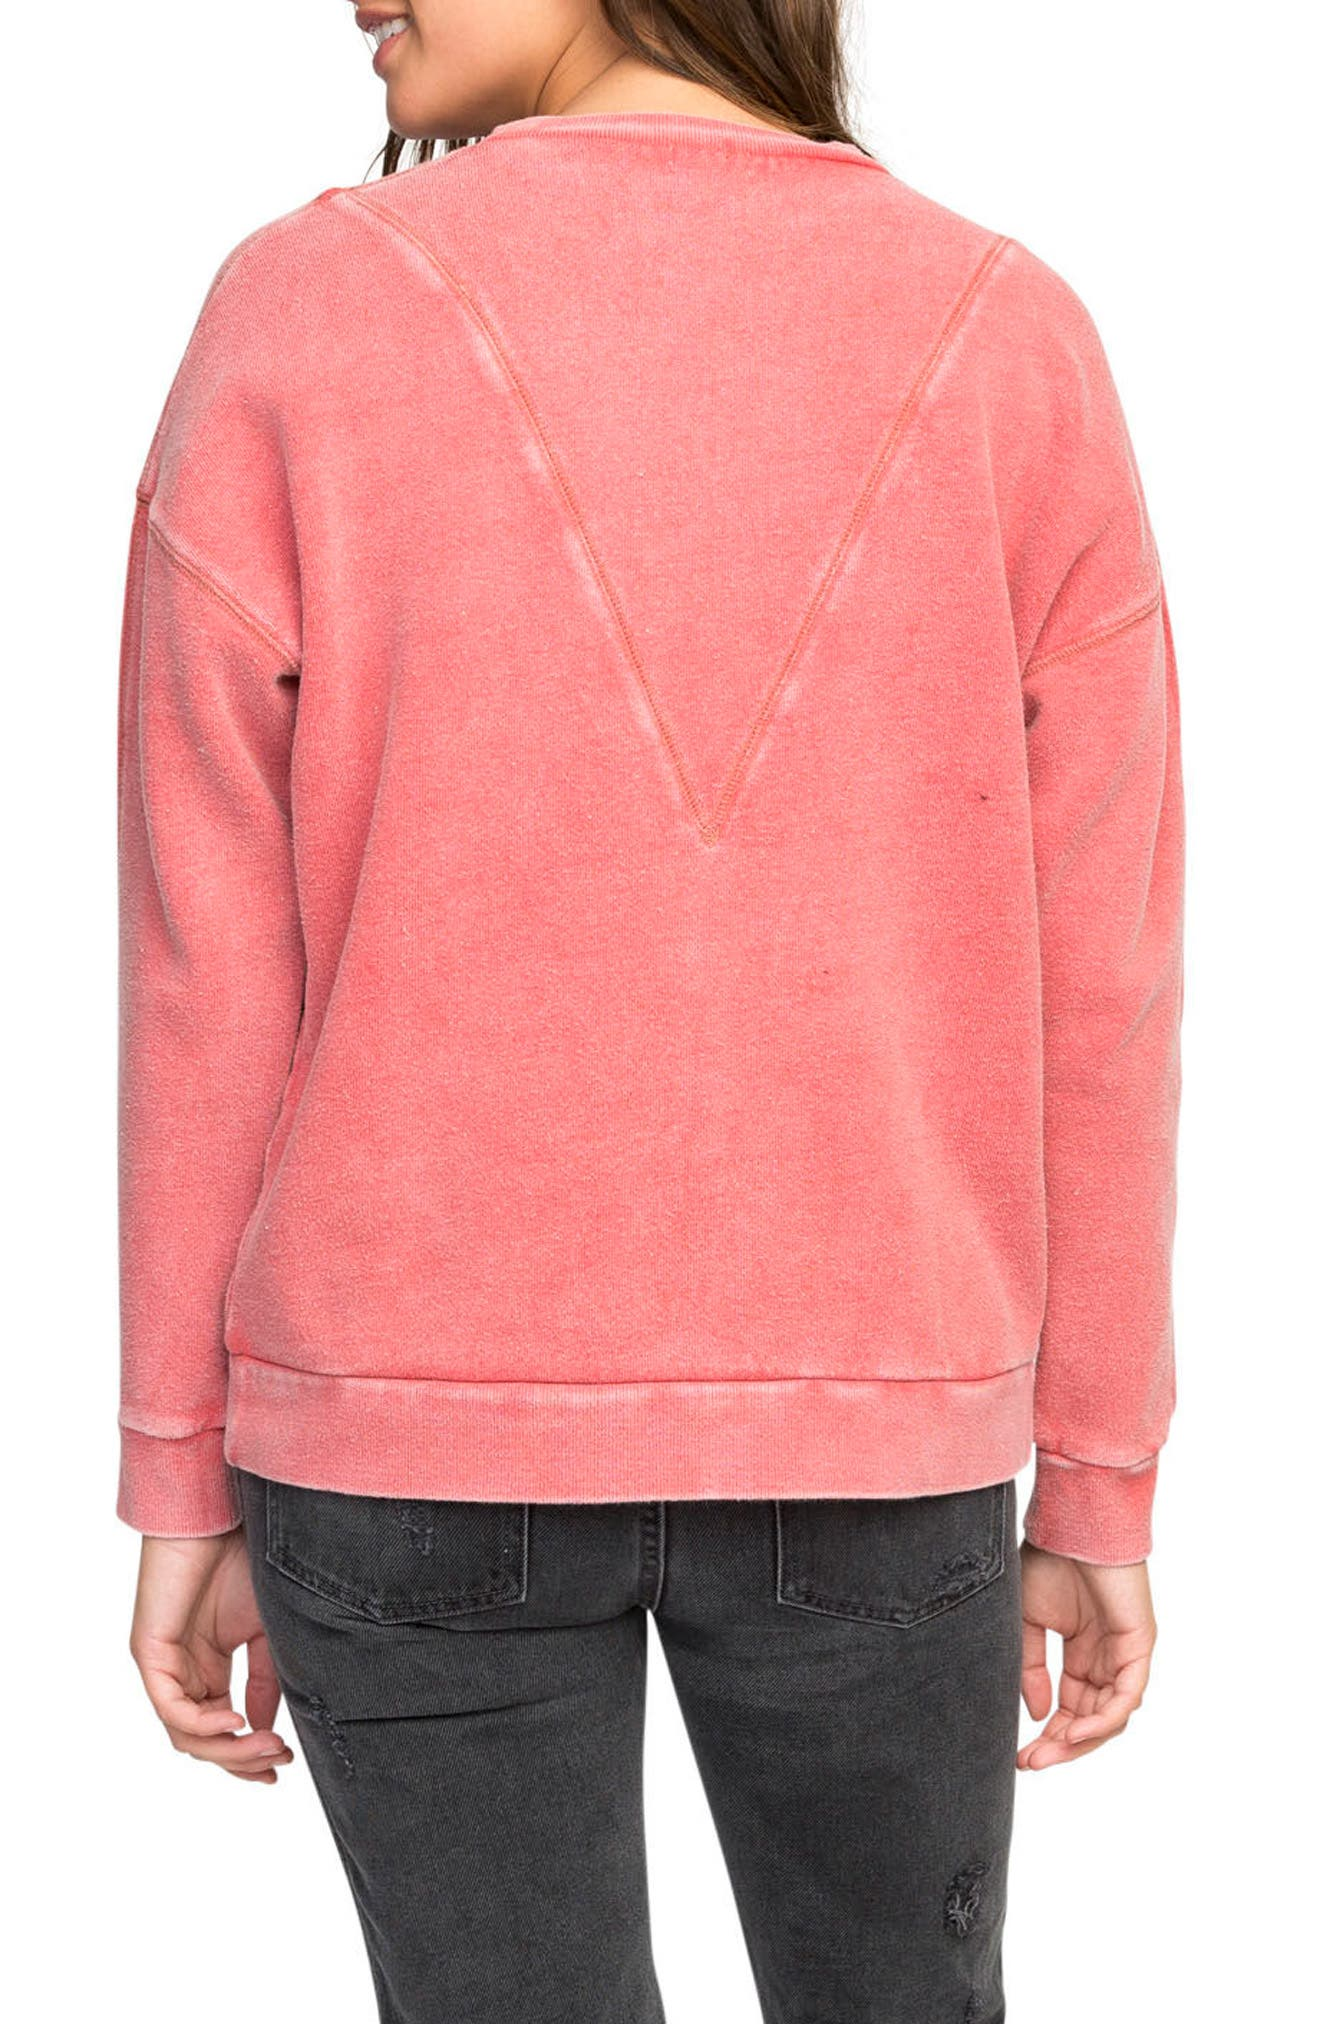 Take Care Sweatshirt,                             Alternate thumbnail 4, color,